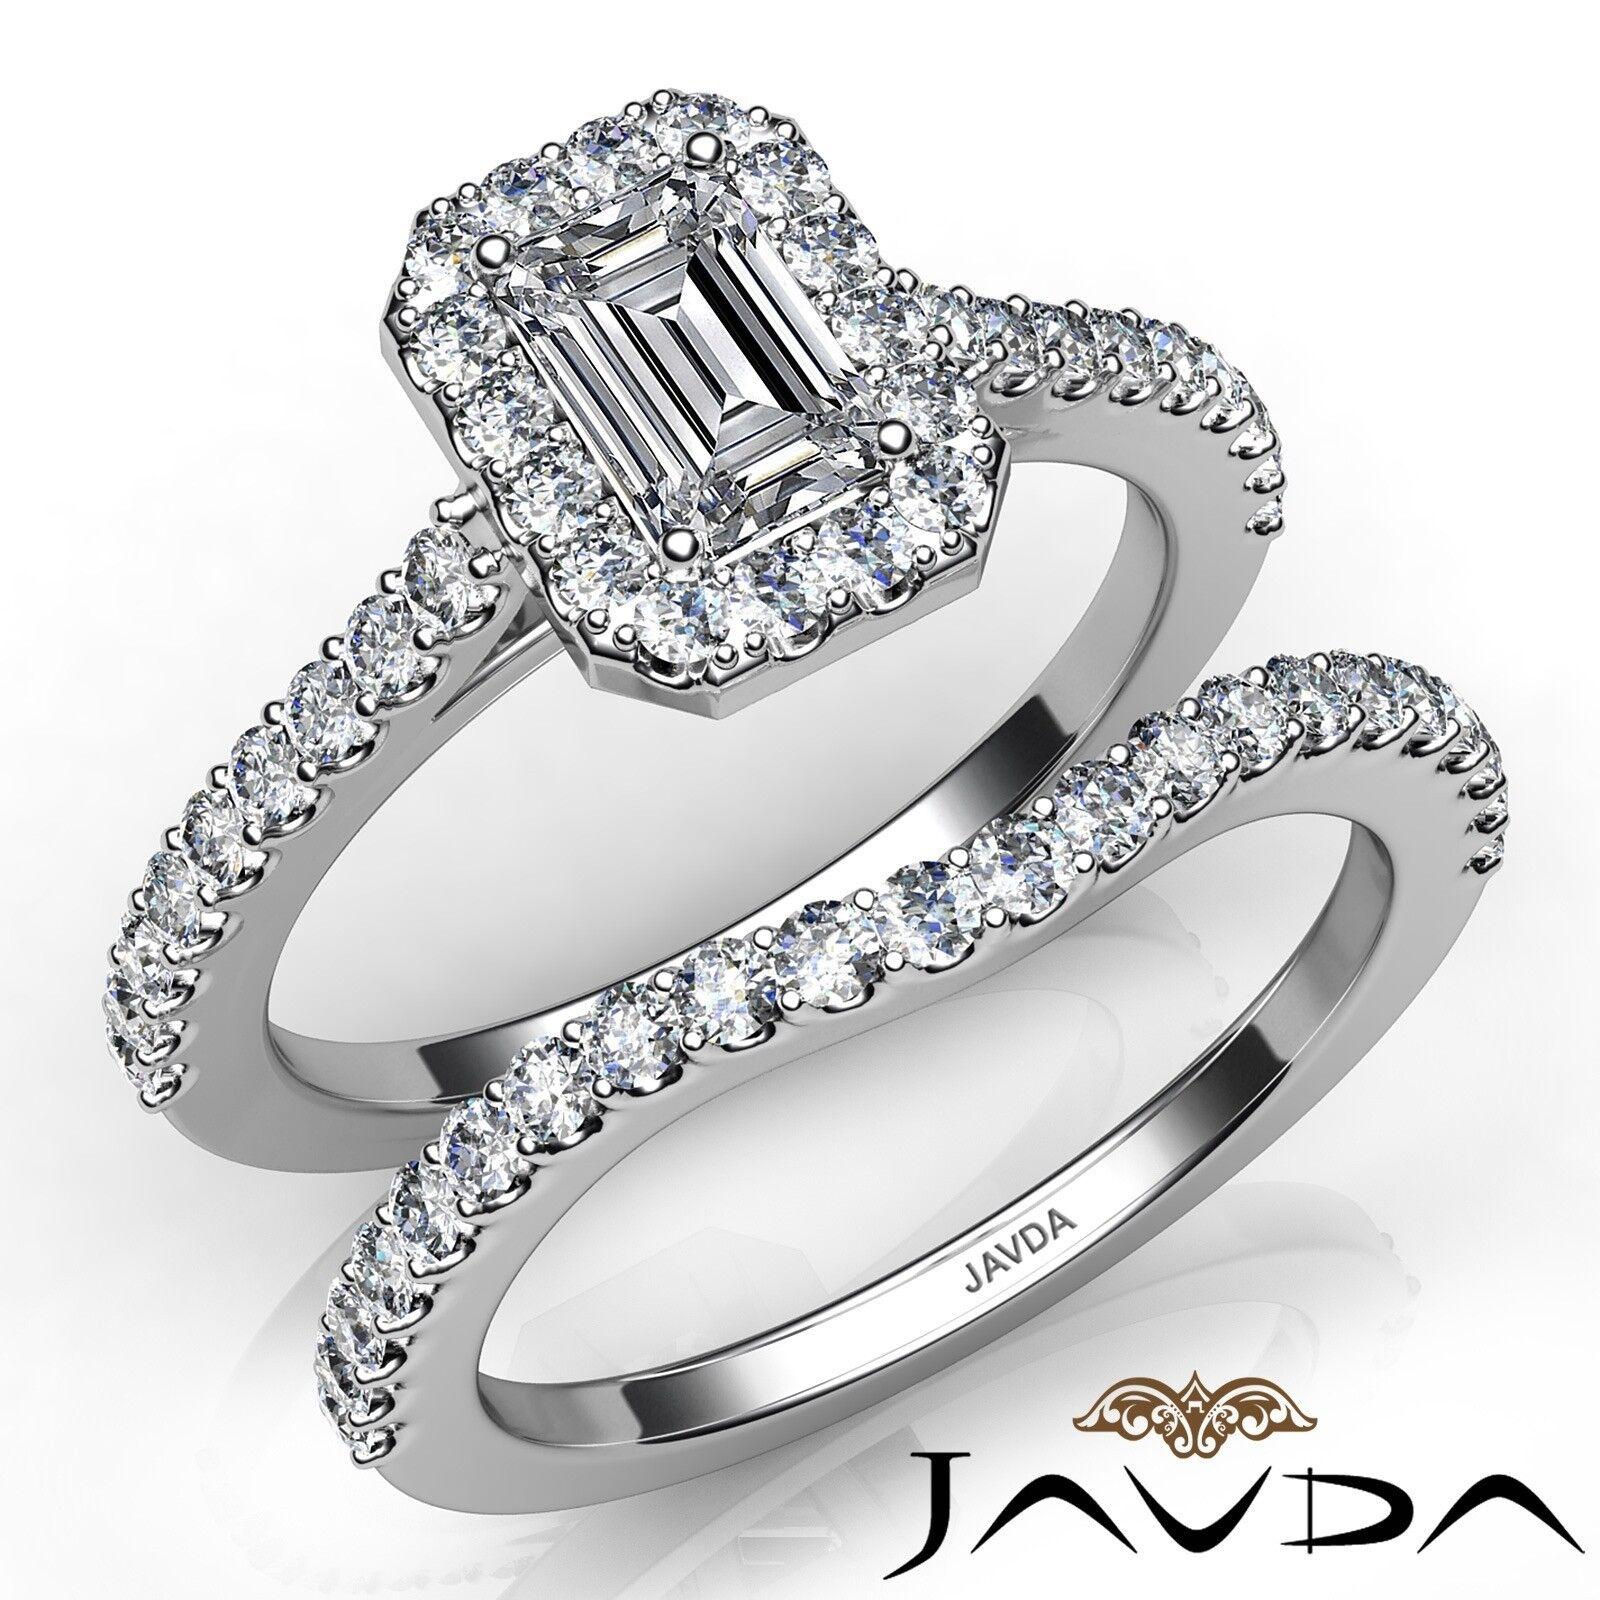 1.65ctw Sidestone Bridal Halo Emerald Diamond Engagement Ring GIA F-VS2 W Gold